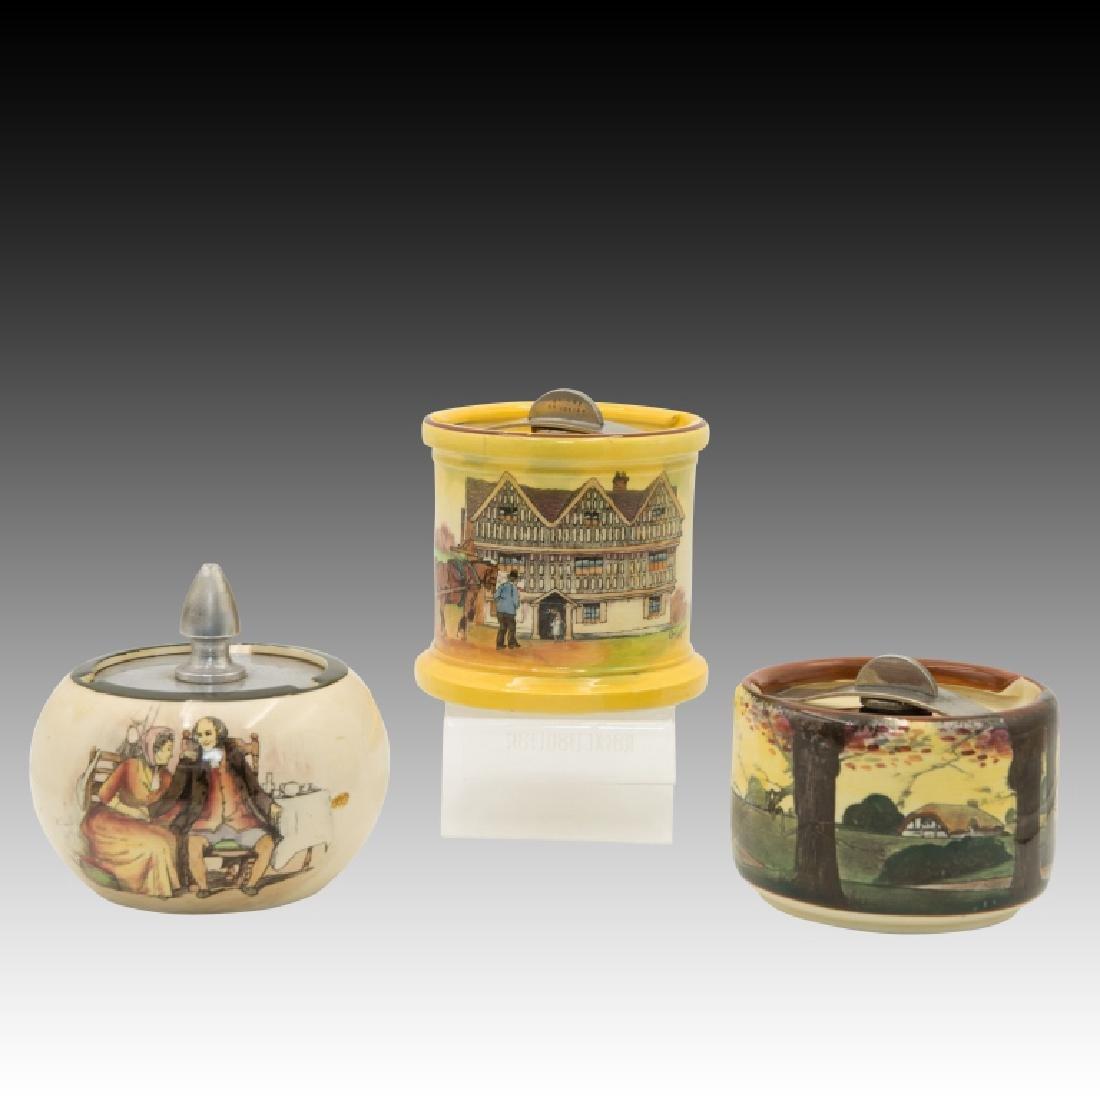 3 Royal Doulton Seriesware Tobacco Jars